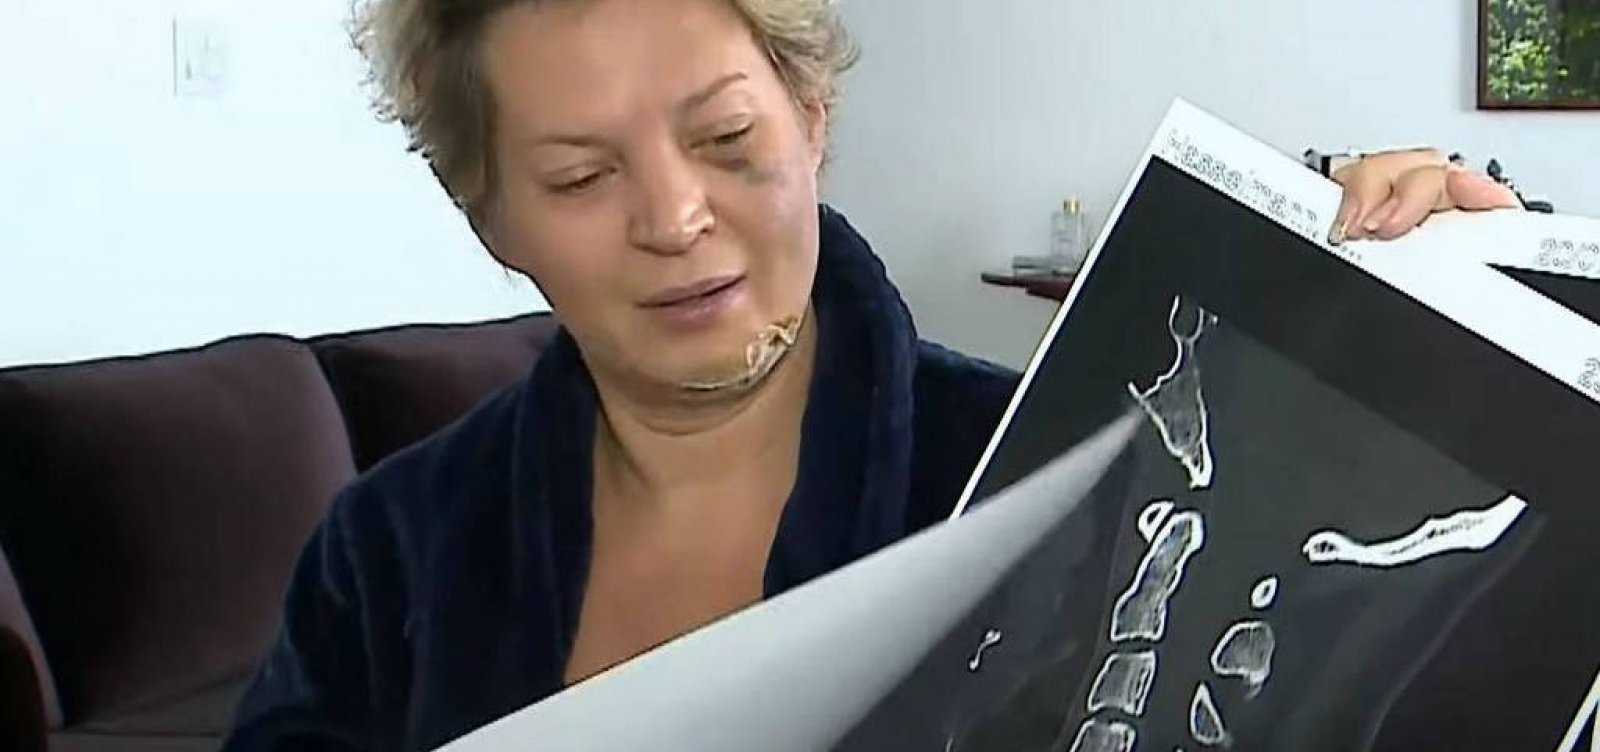 Deputada Joice Hasselman descarta violência doméstica após 5 fraturas no rosto